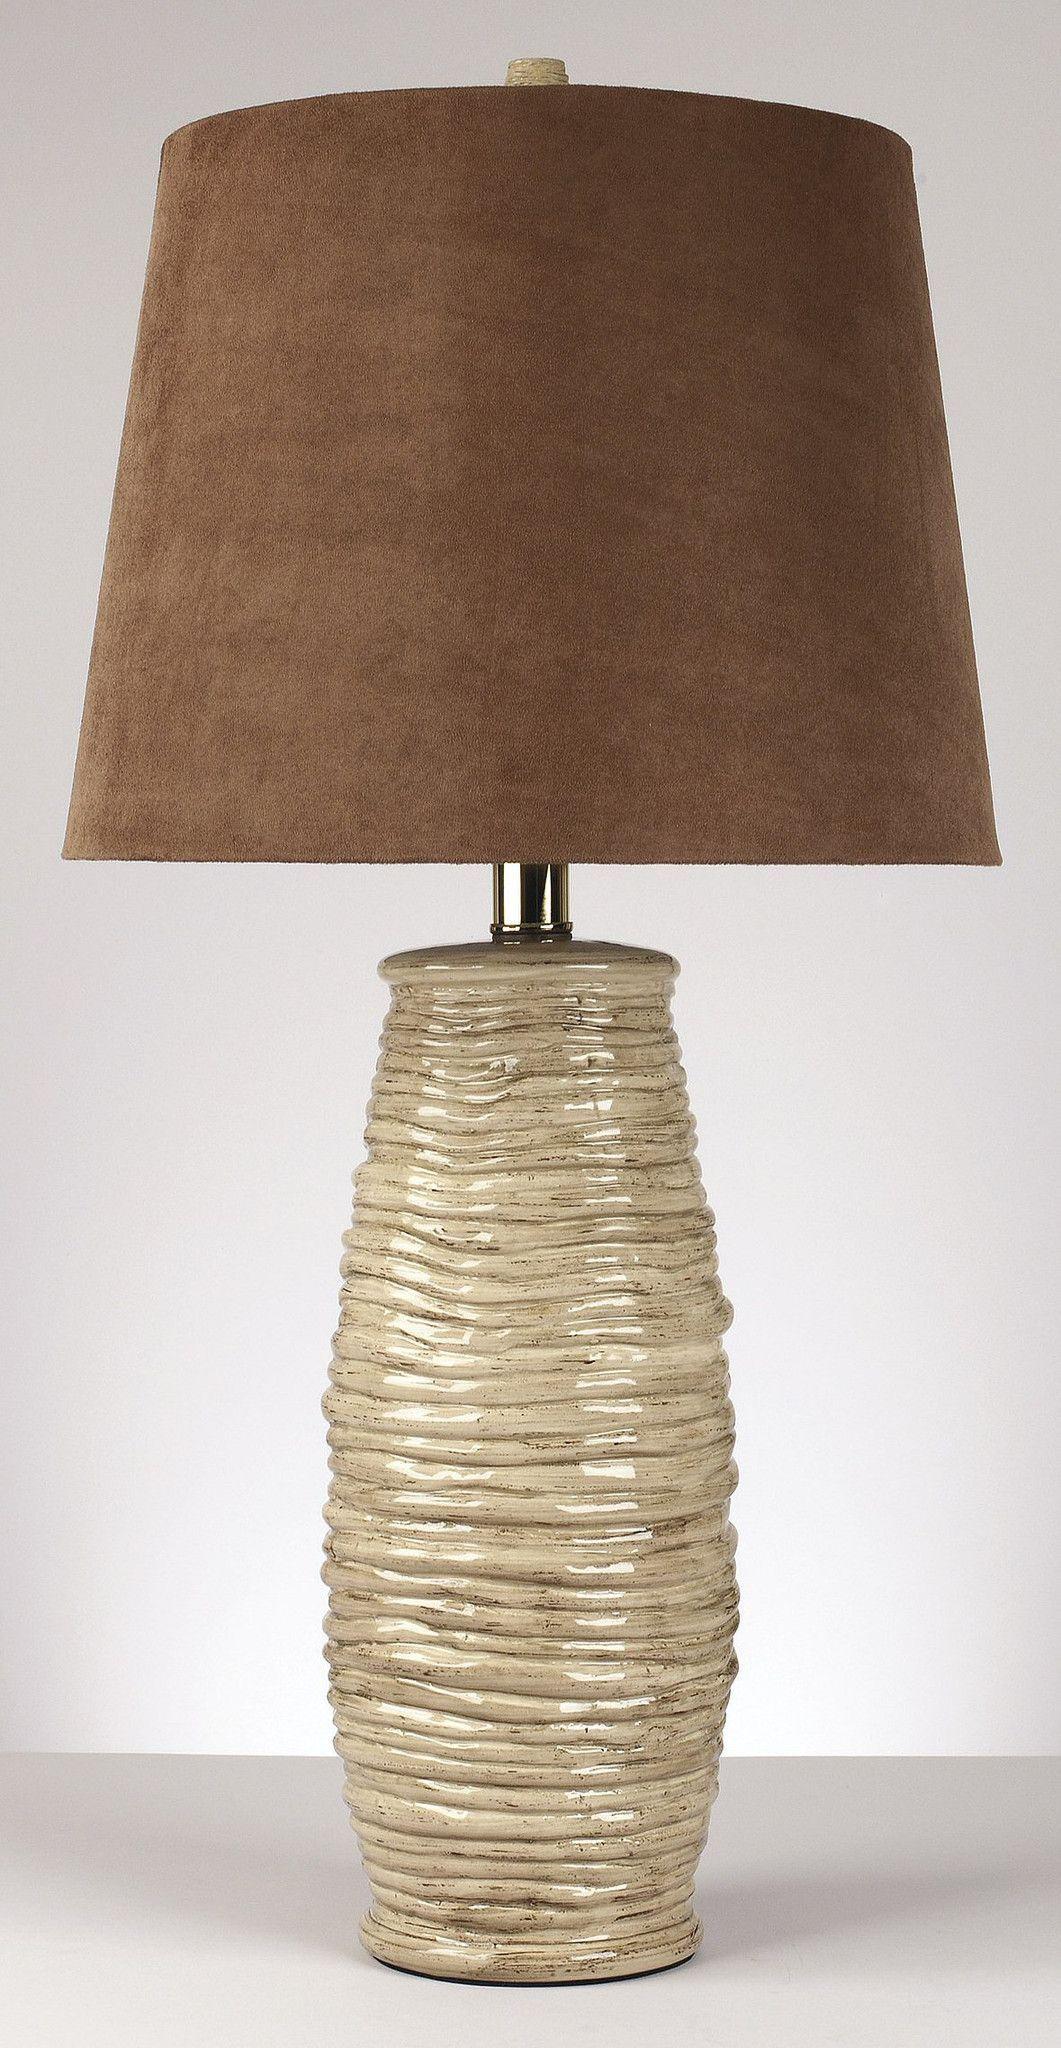 30 inchh haldis set of 2 table lamps textured beige ceramic 30 inchh haldis set of 2 table lamps textured beige ceramic geotapseo Gallery